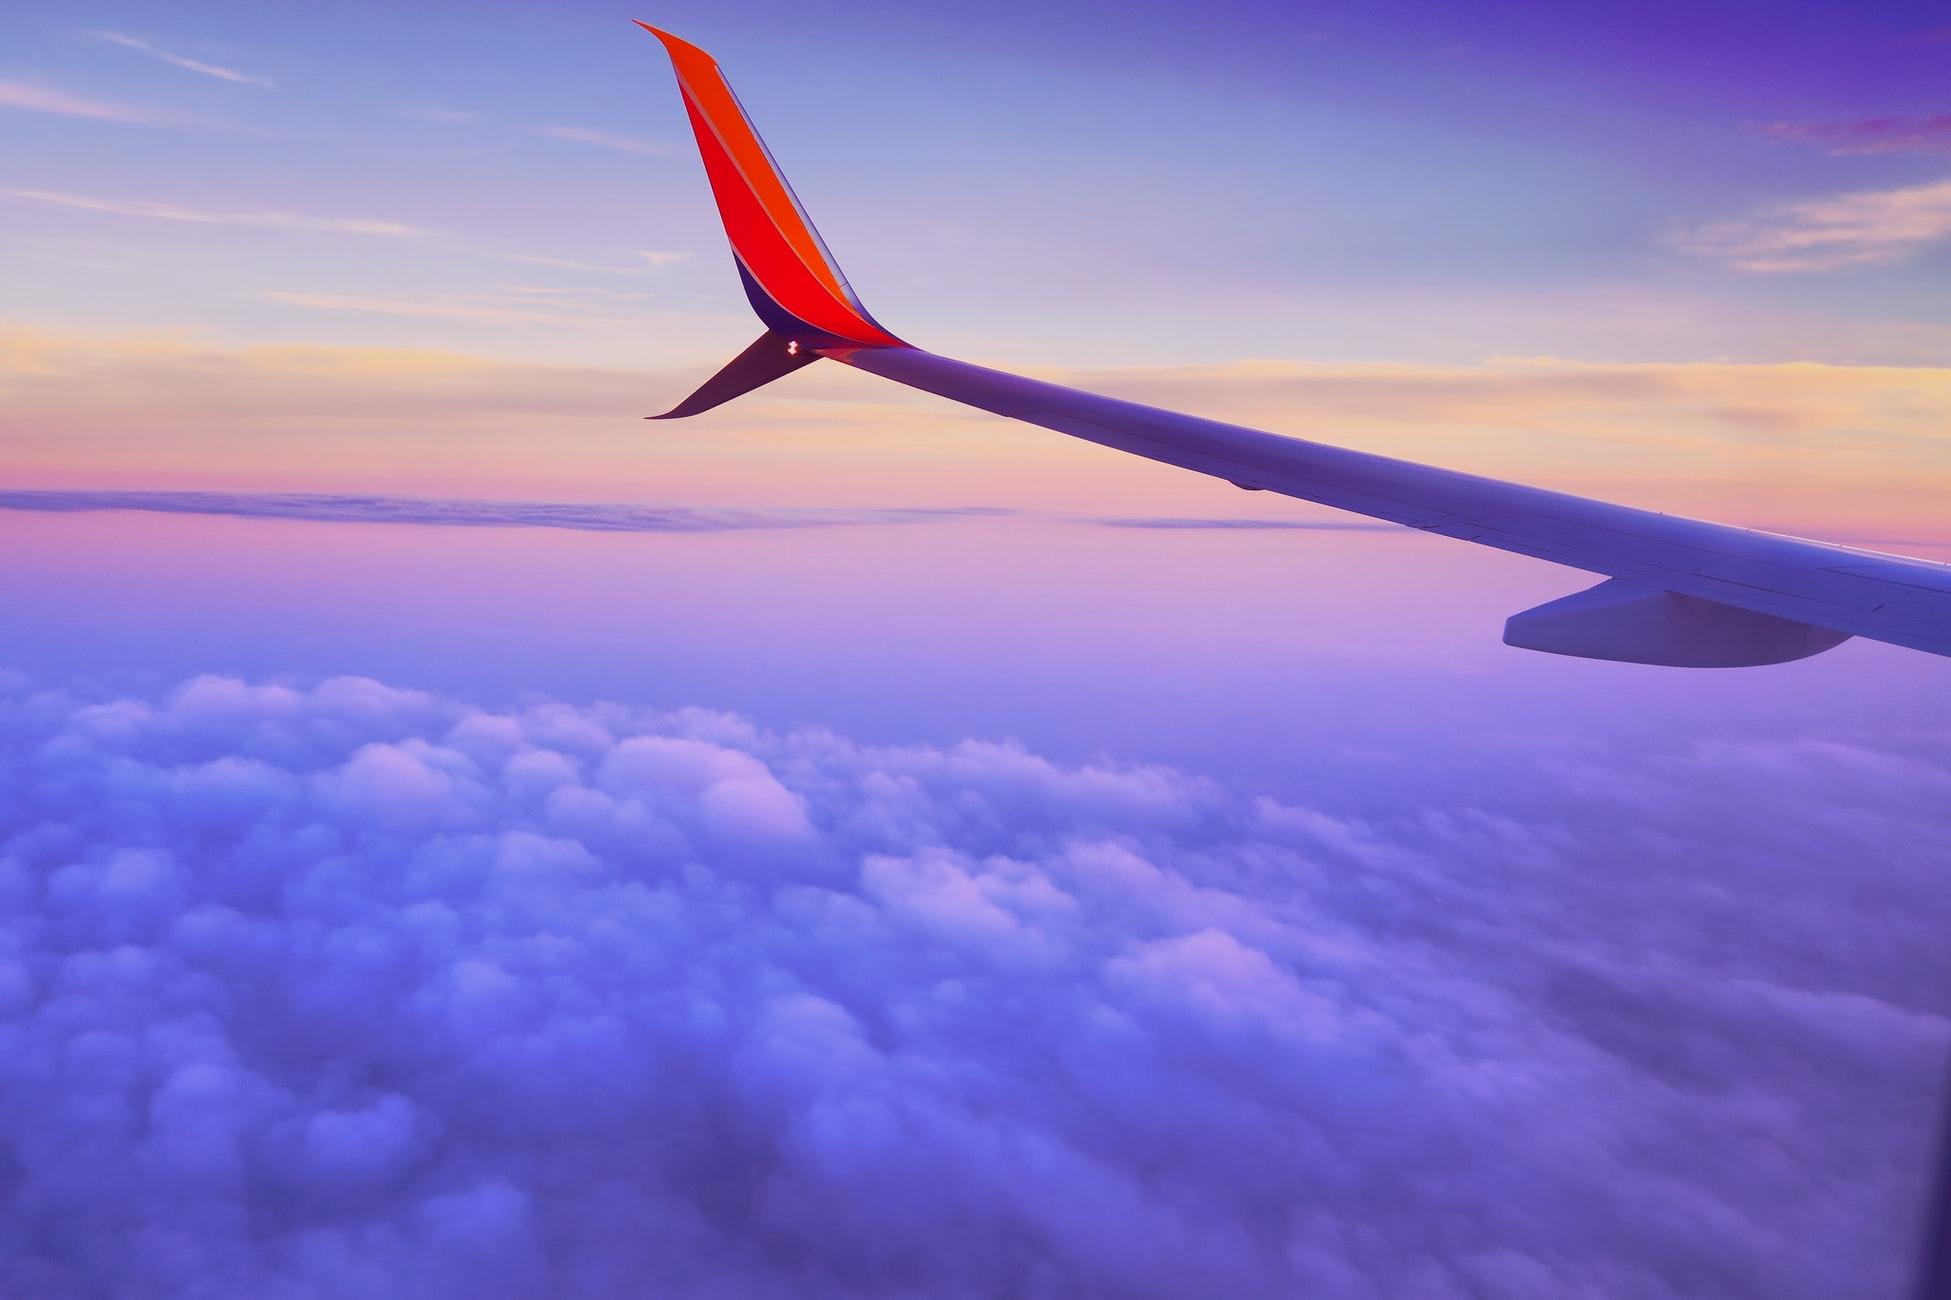 Agence de voyage professionnel en ligne - Okarito